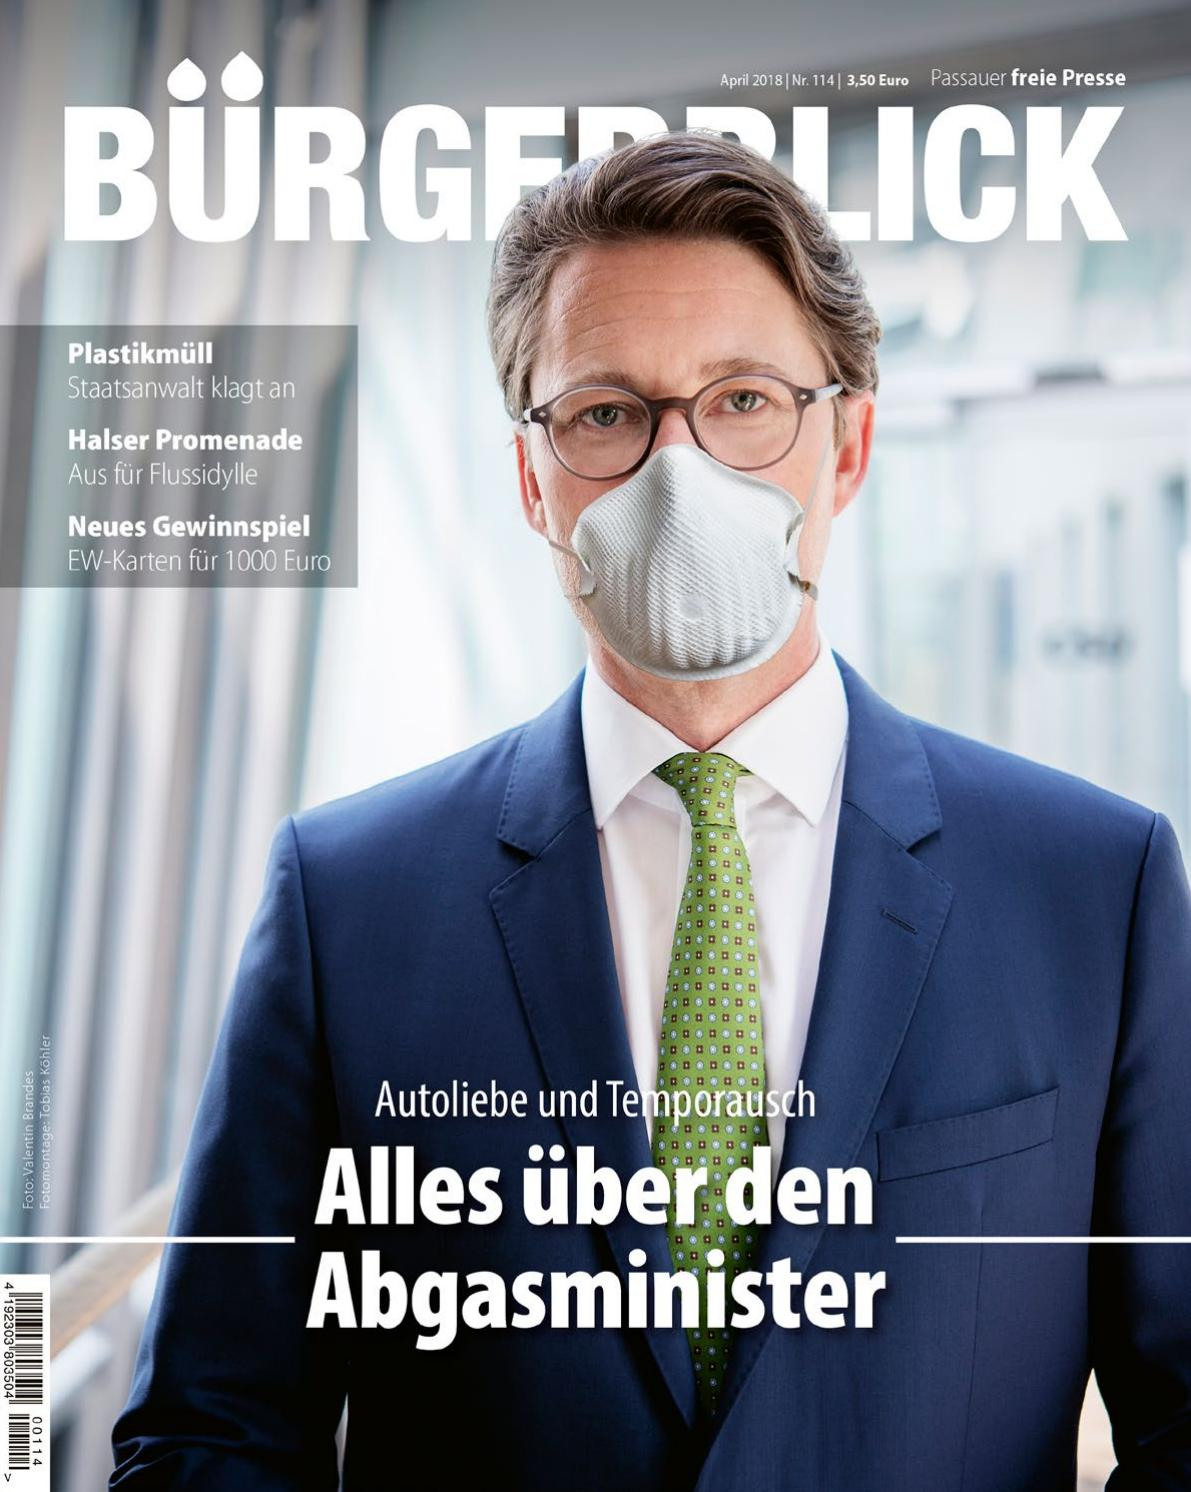 Burgerblick Nr 114 By Hubert Jakob Denk Issuu